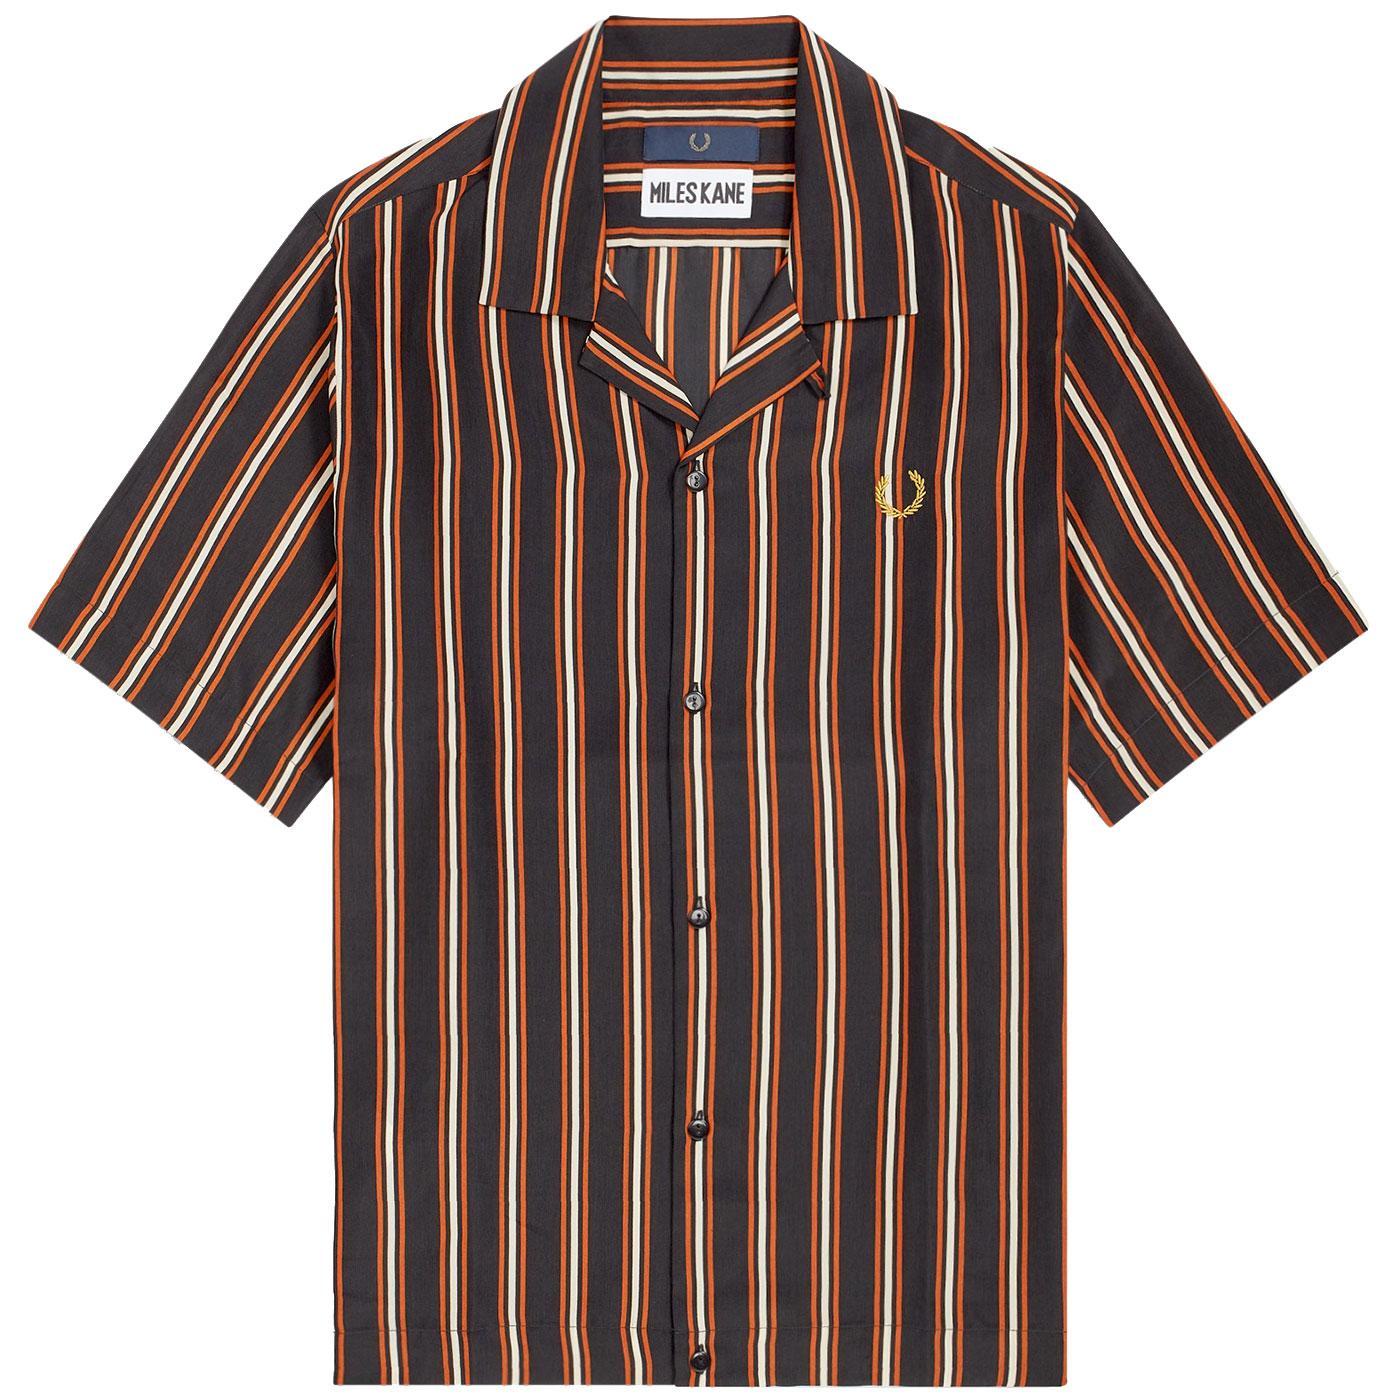 FRED PERRY X MILES KANE Mod Stripe Bowling Shirt